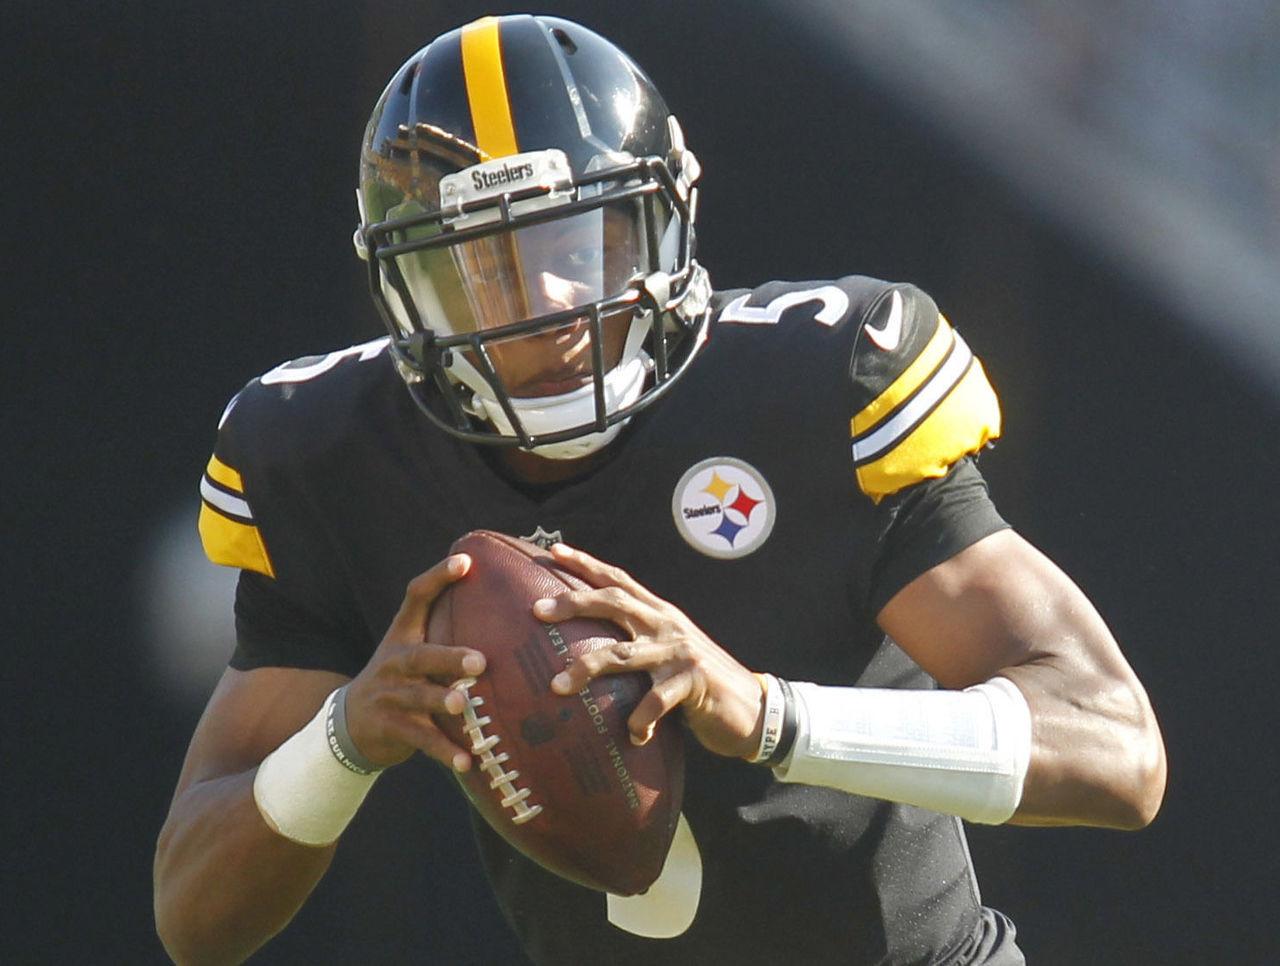 Watch: Steelers' Dobbs throws ridiculously careless interception